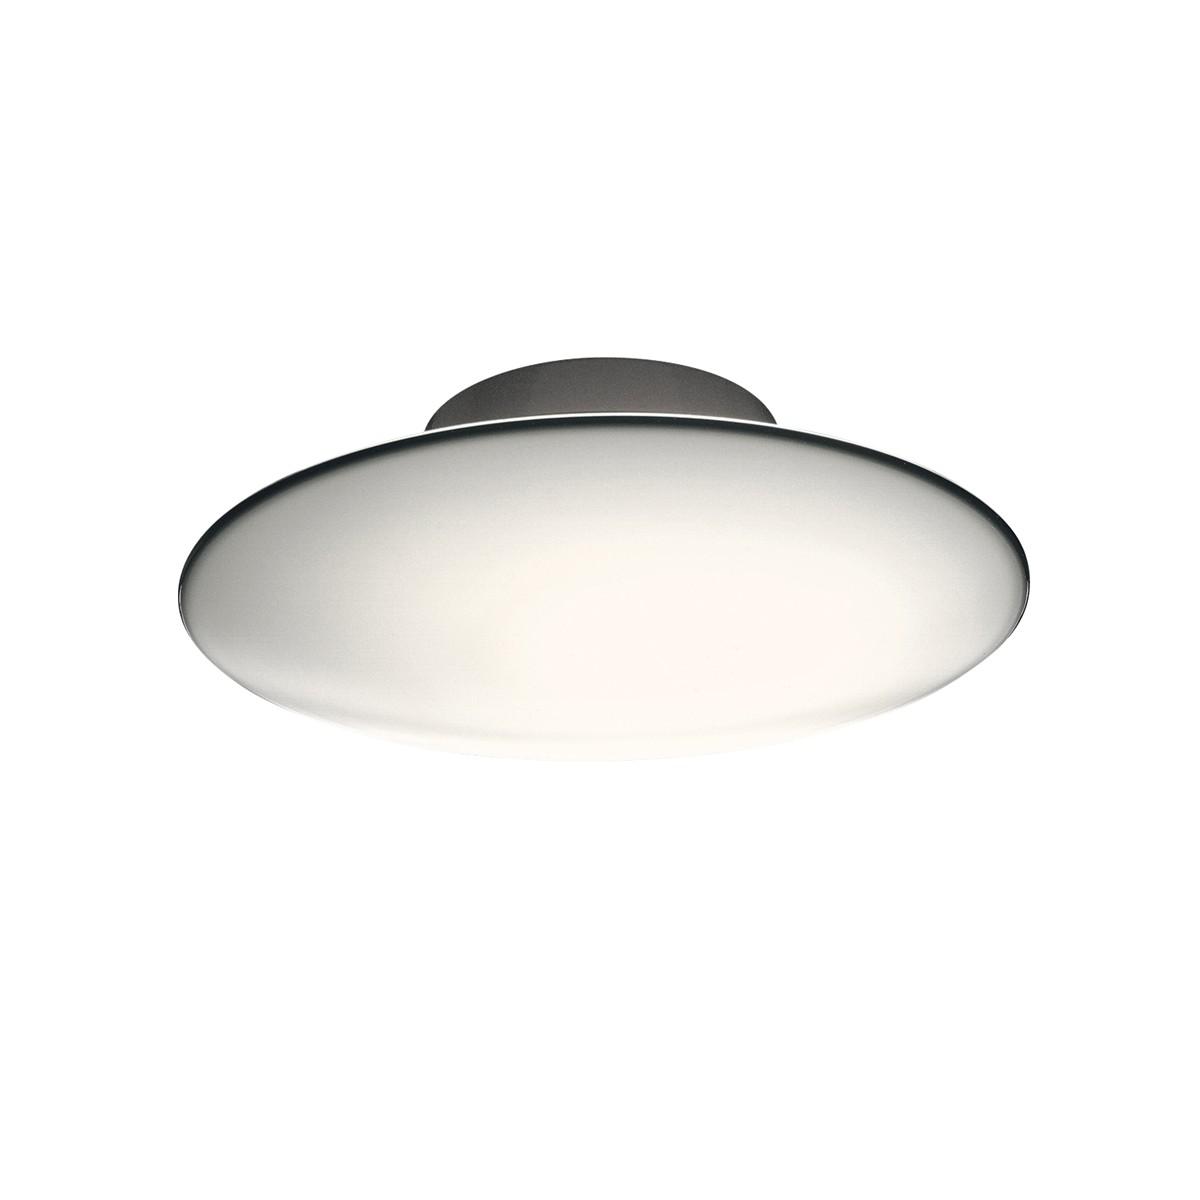 Louis Poulsen AJ Eklipta LED Wand- / Deckenleuchte, Ø: 22 cm, opalweiß